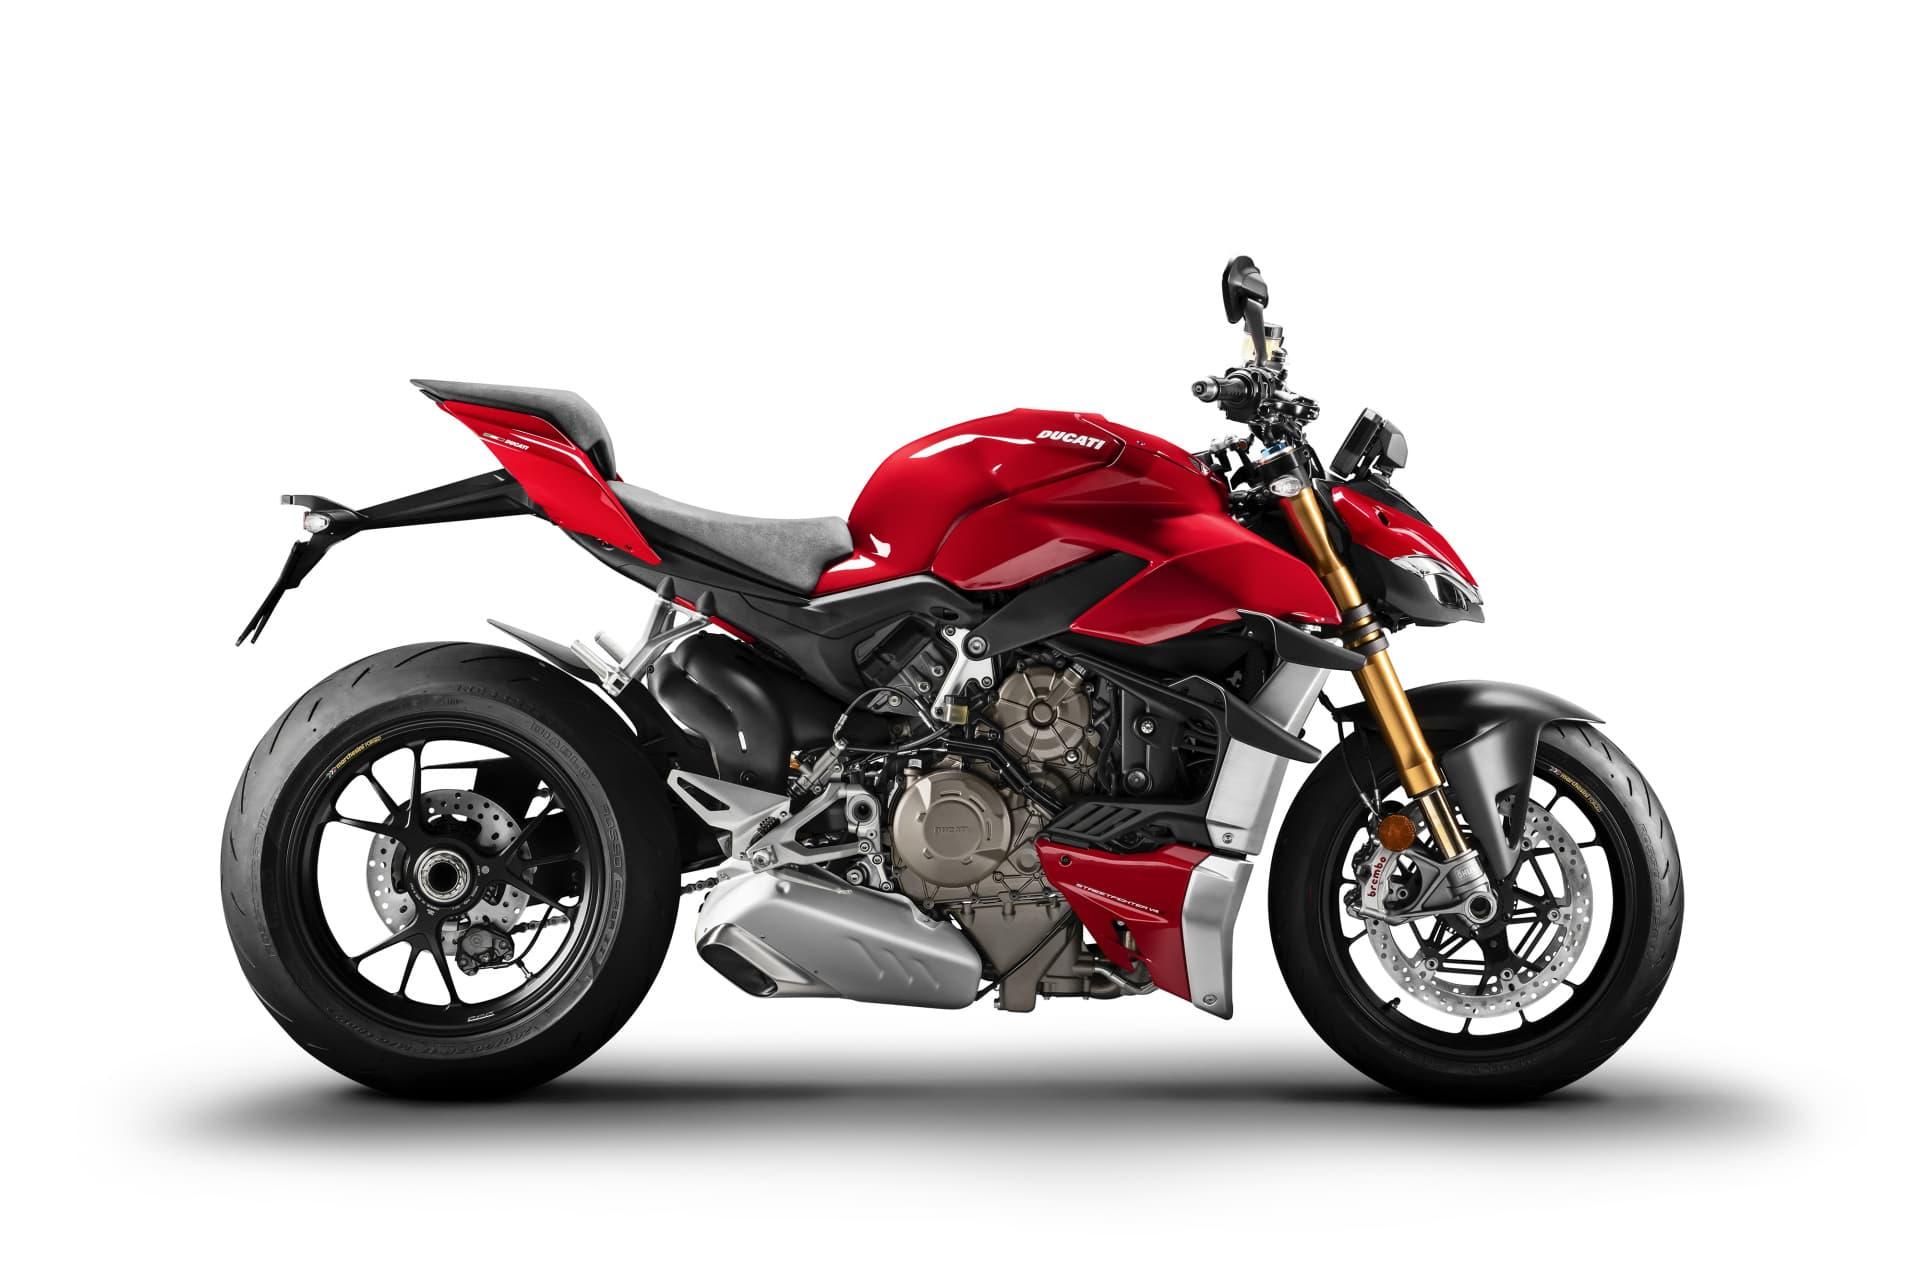 My20 Ducati Streetfigher V4 S 03 Uc101684 Mid